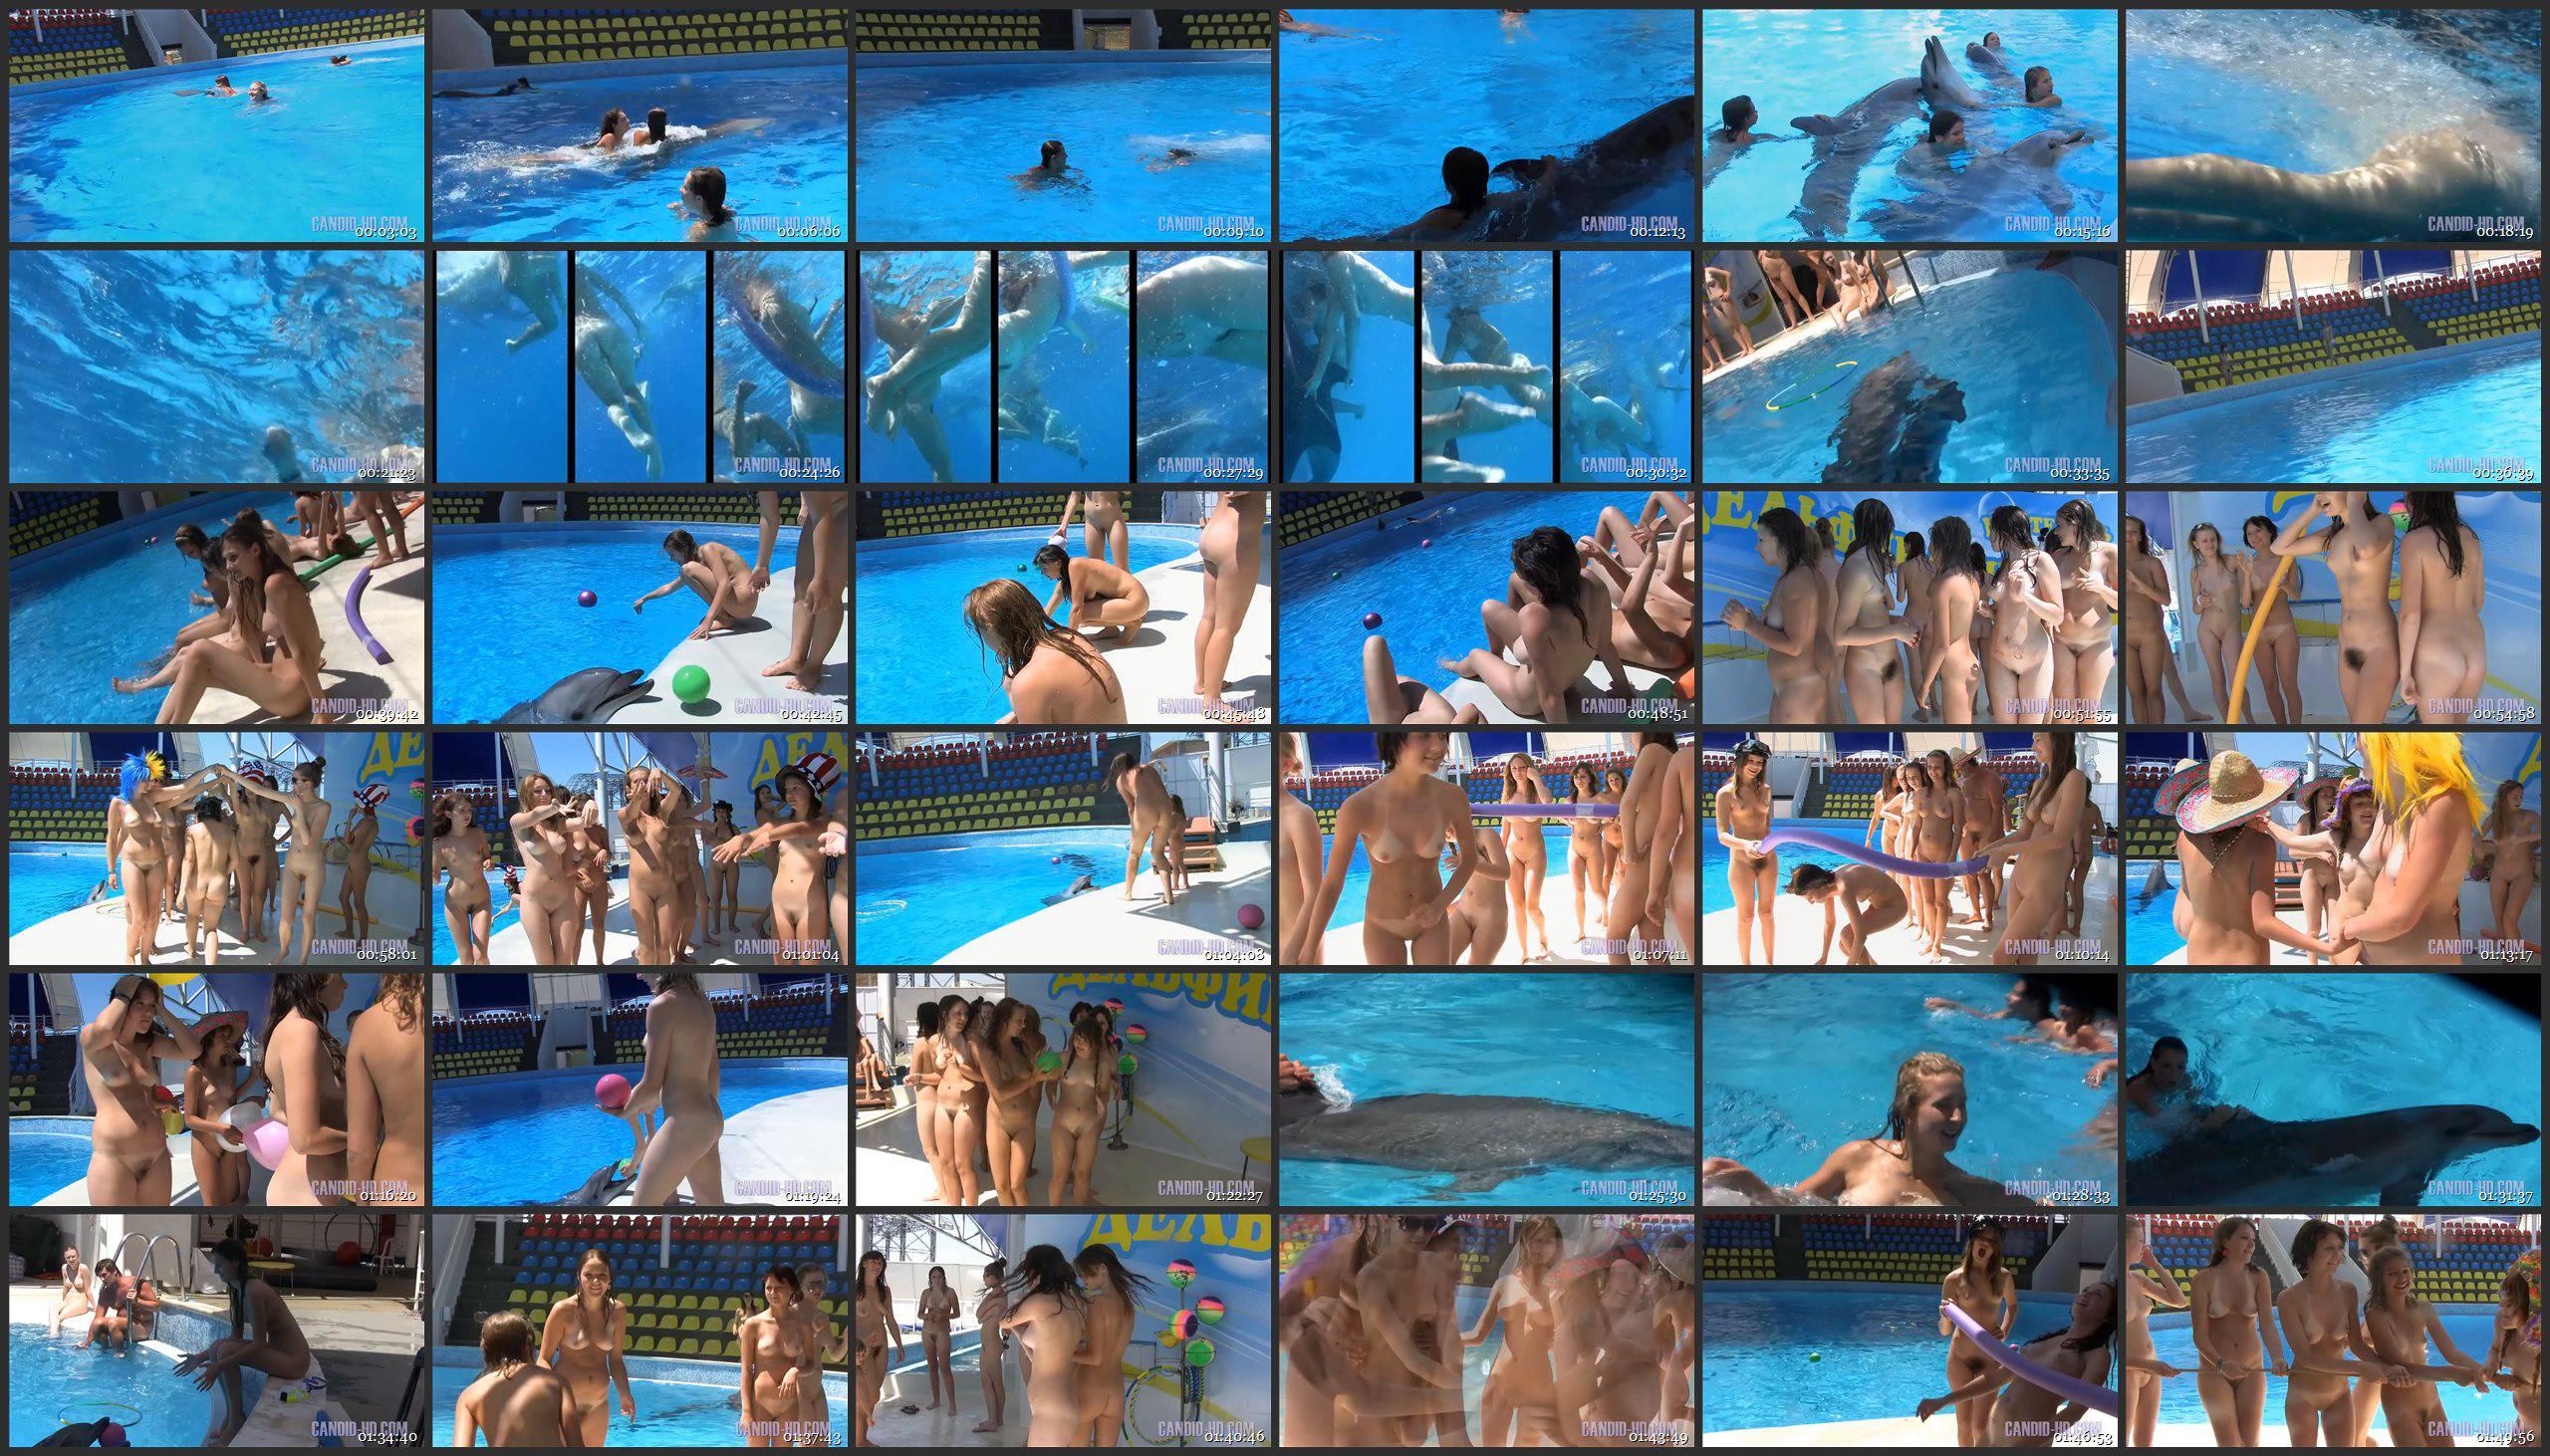 Candid-HD.com-Amazing Dolphin Encounter - Thumbnails